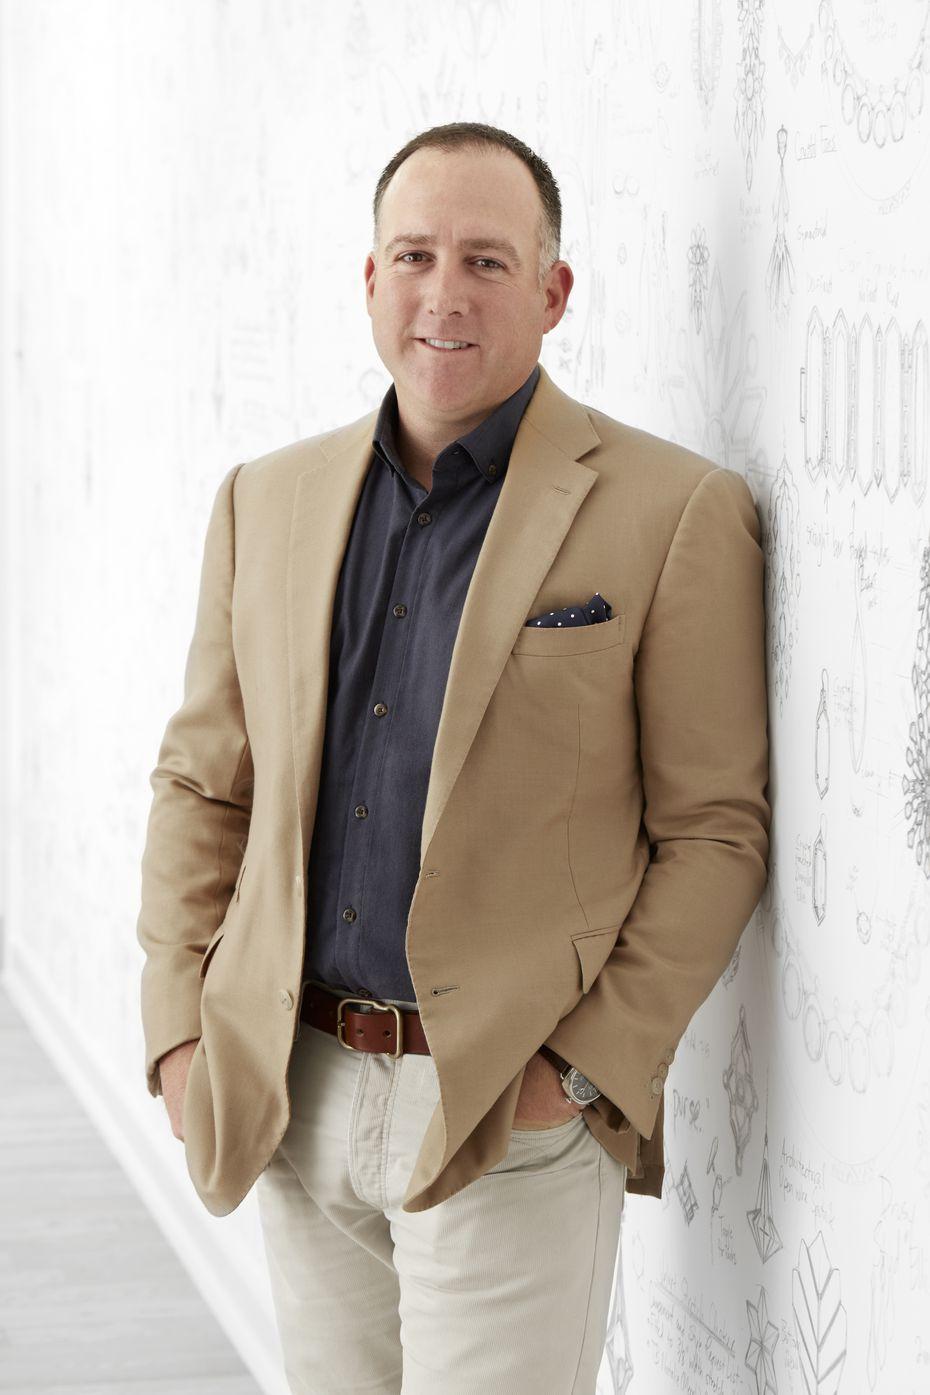 Tom Nolan is CEO of Austin-based Kendra Scott.